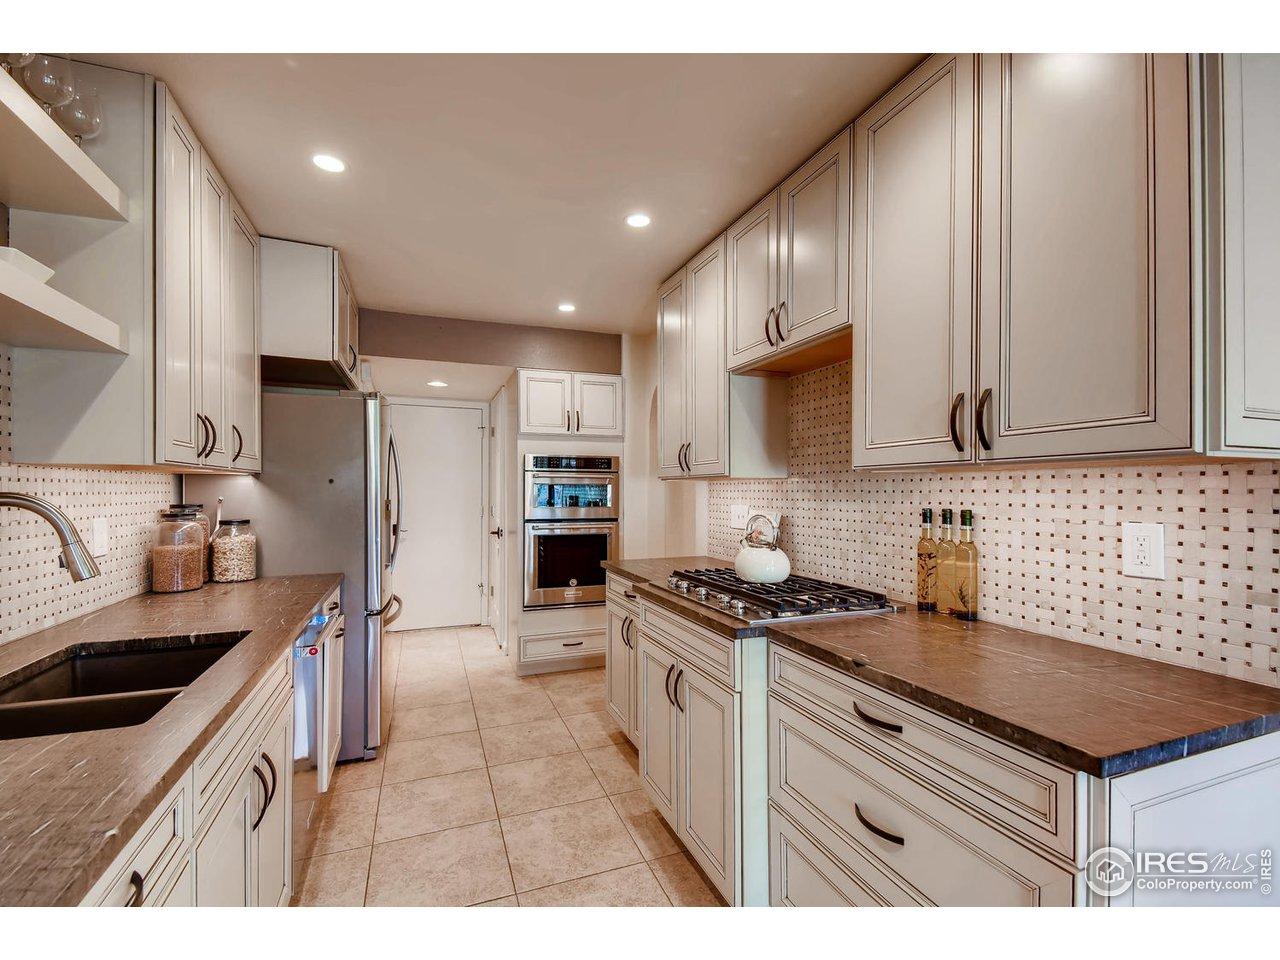 All New Kitchen w/ Custom Cabinets